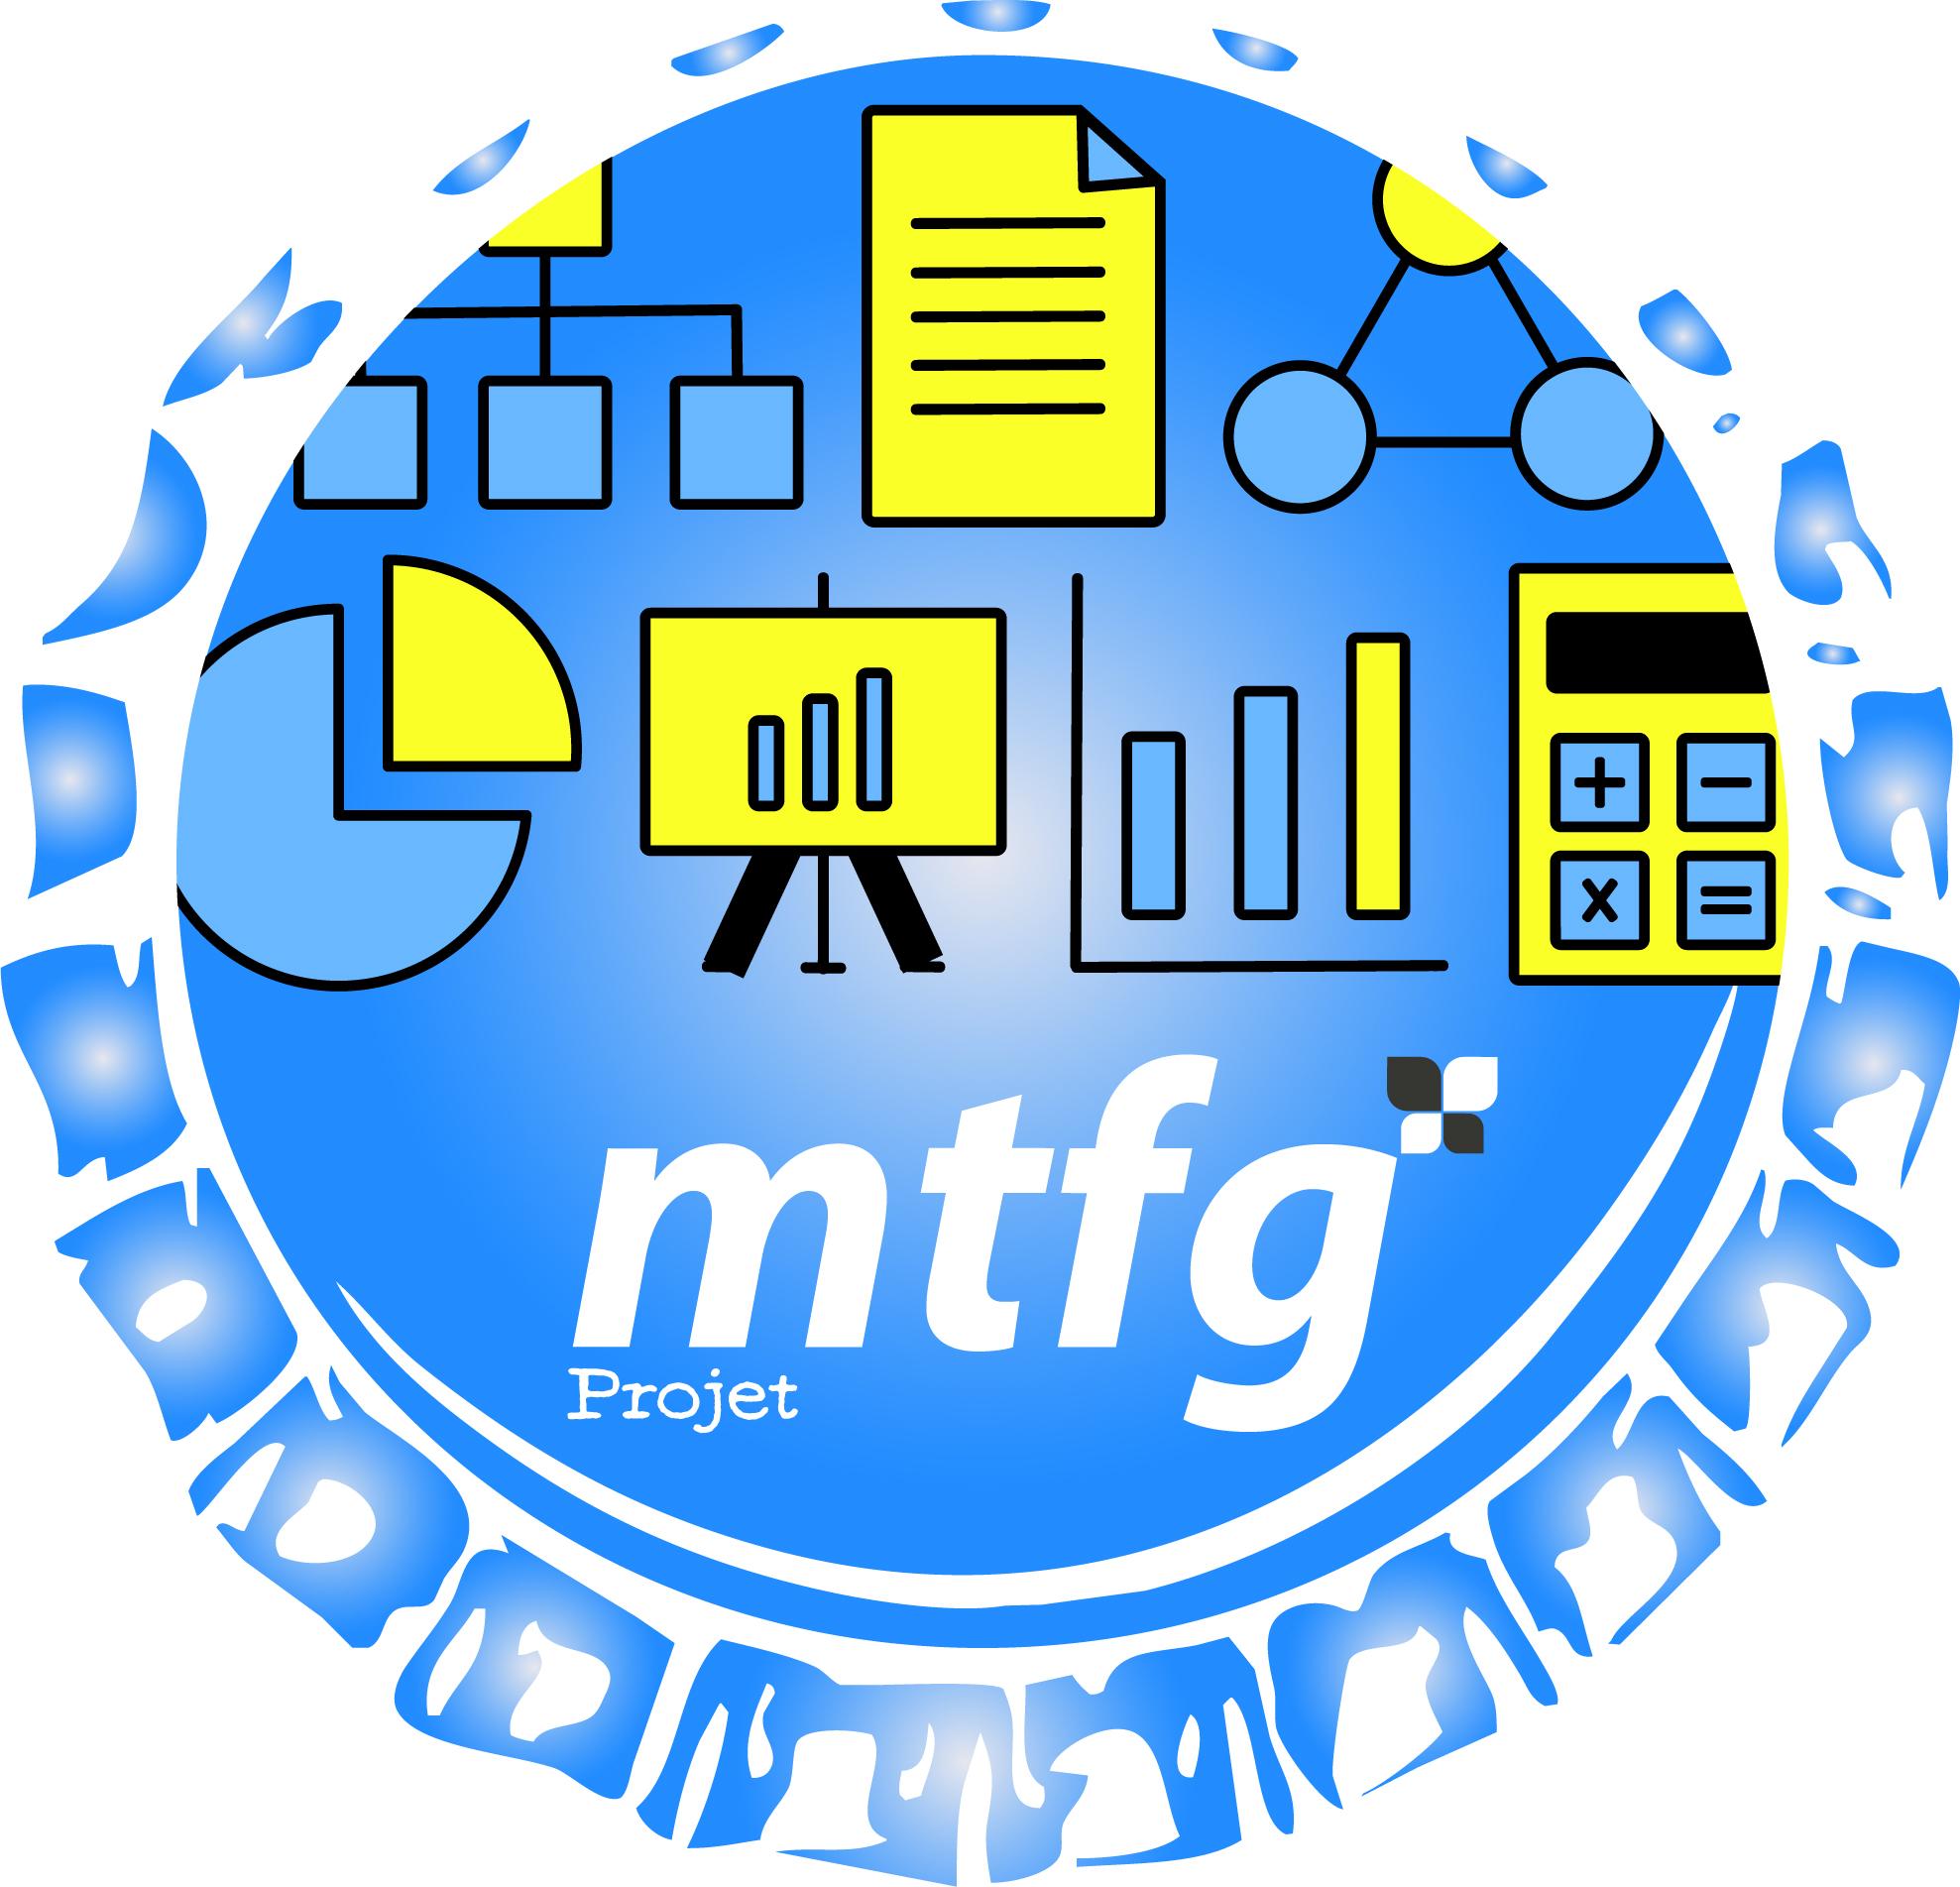 MTFG Projet